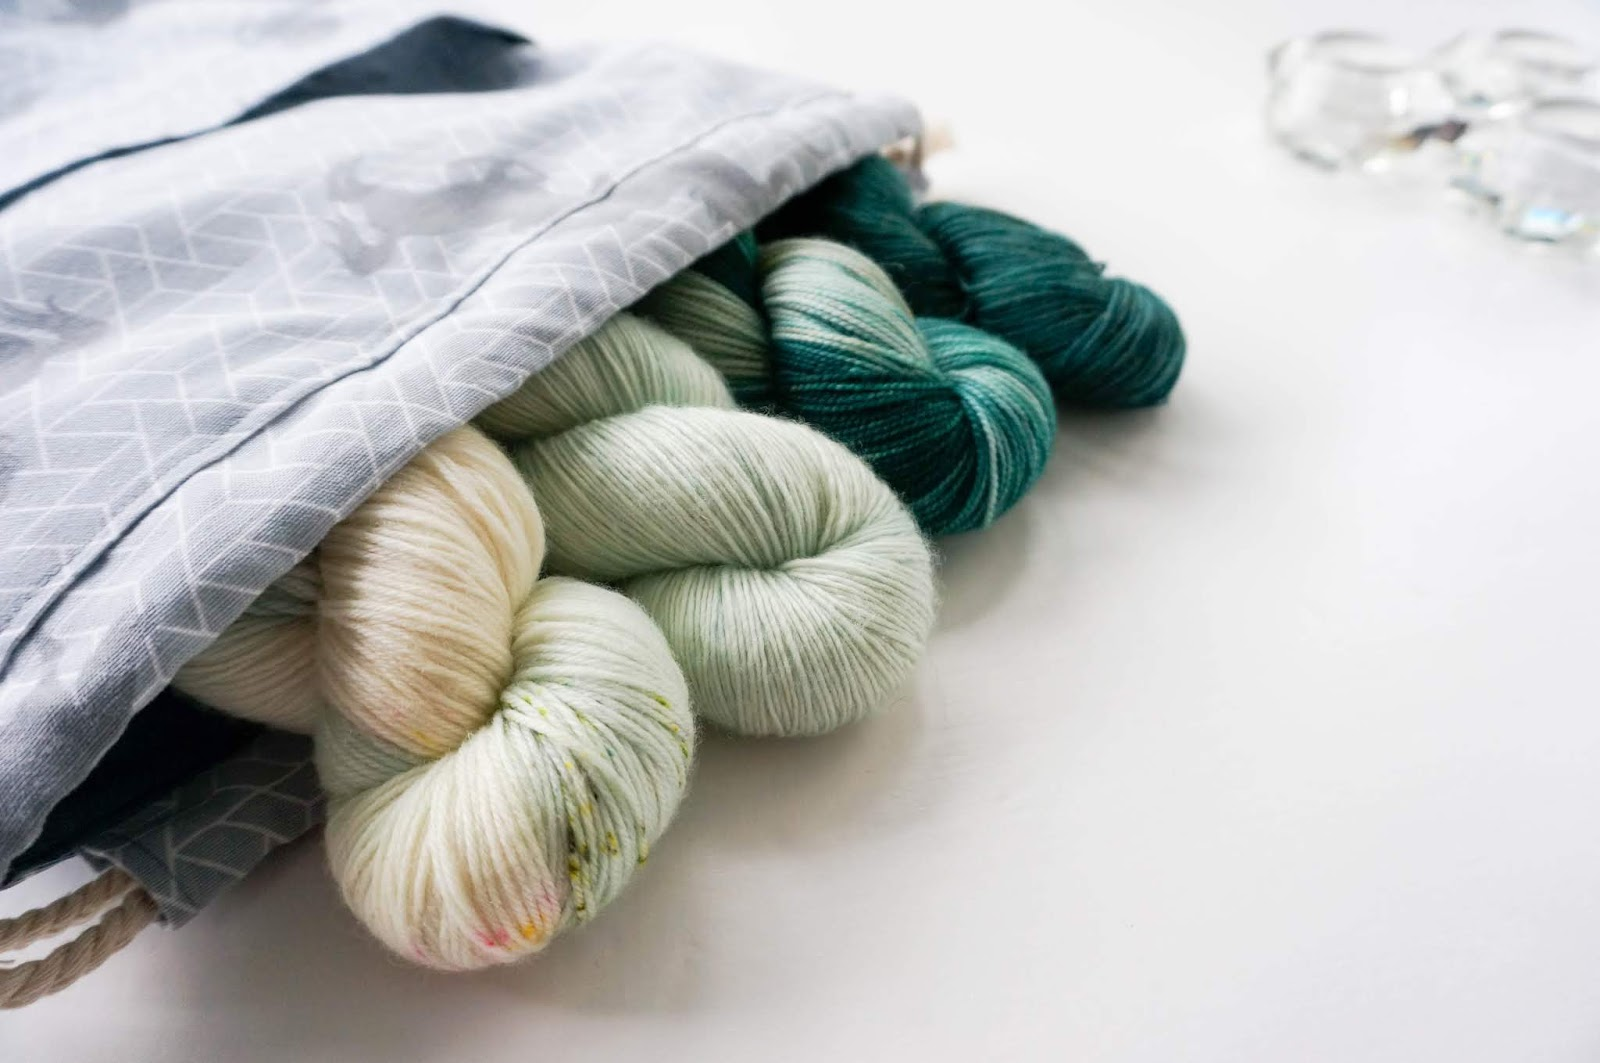 Review of Joji Locatelli Spector Sweater